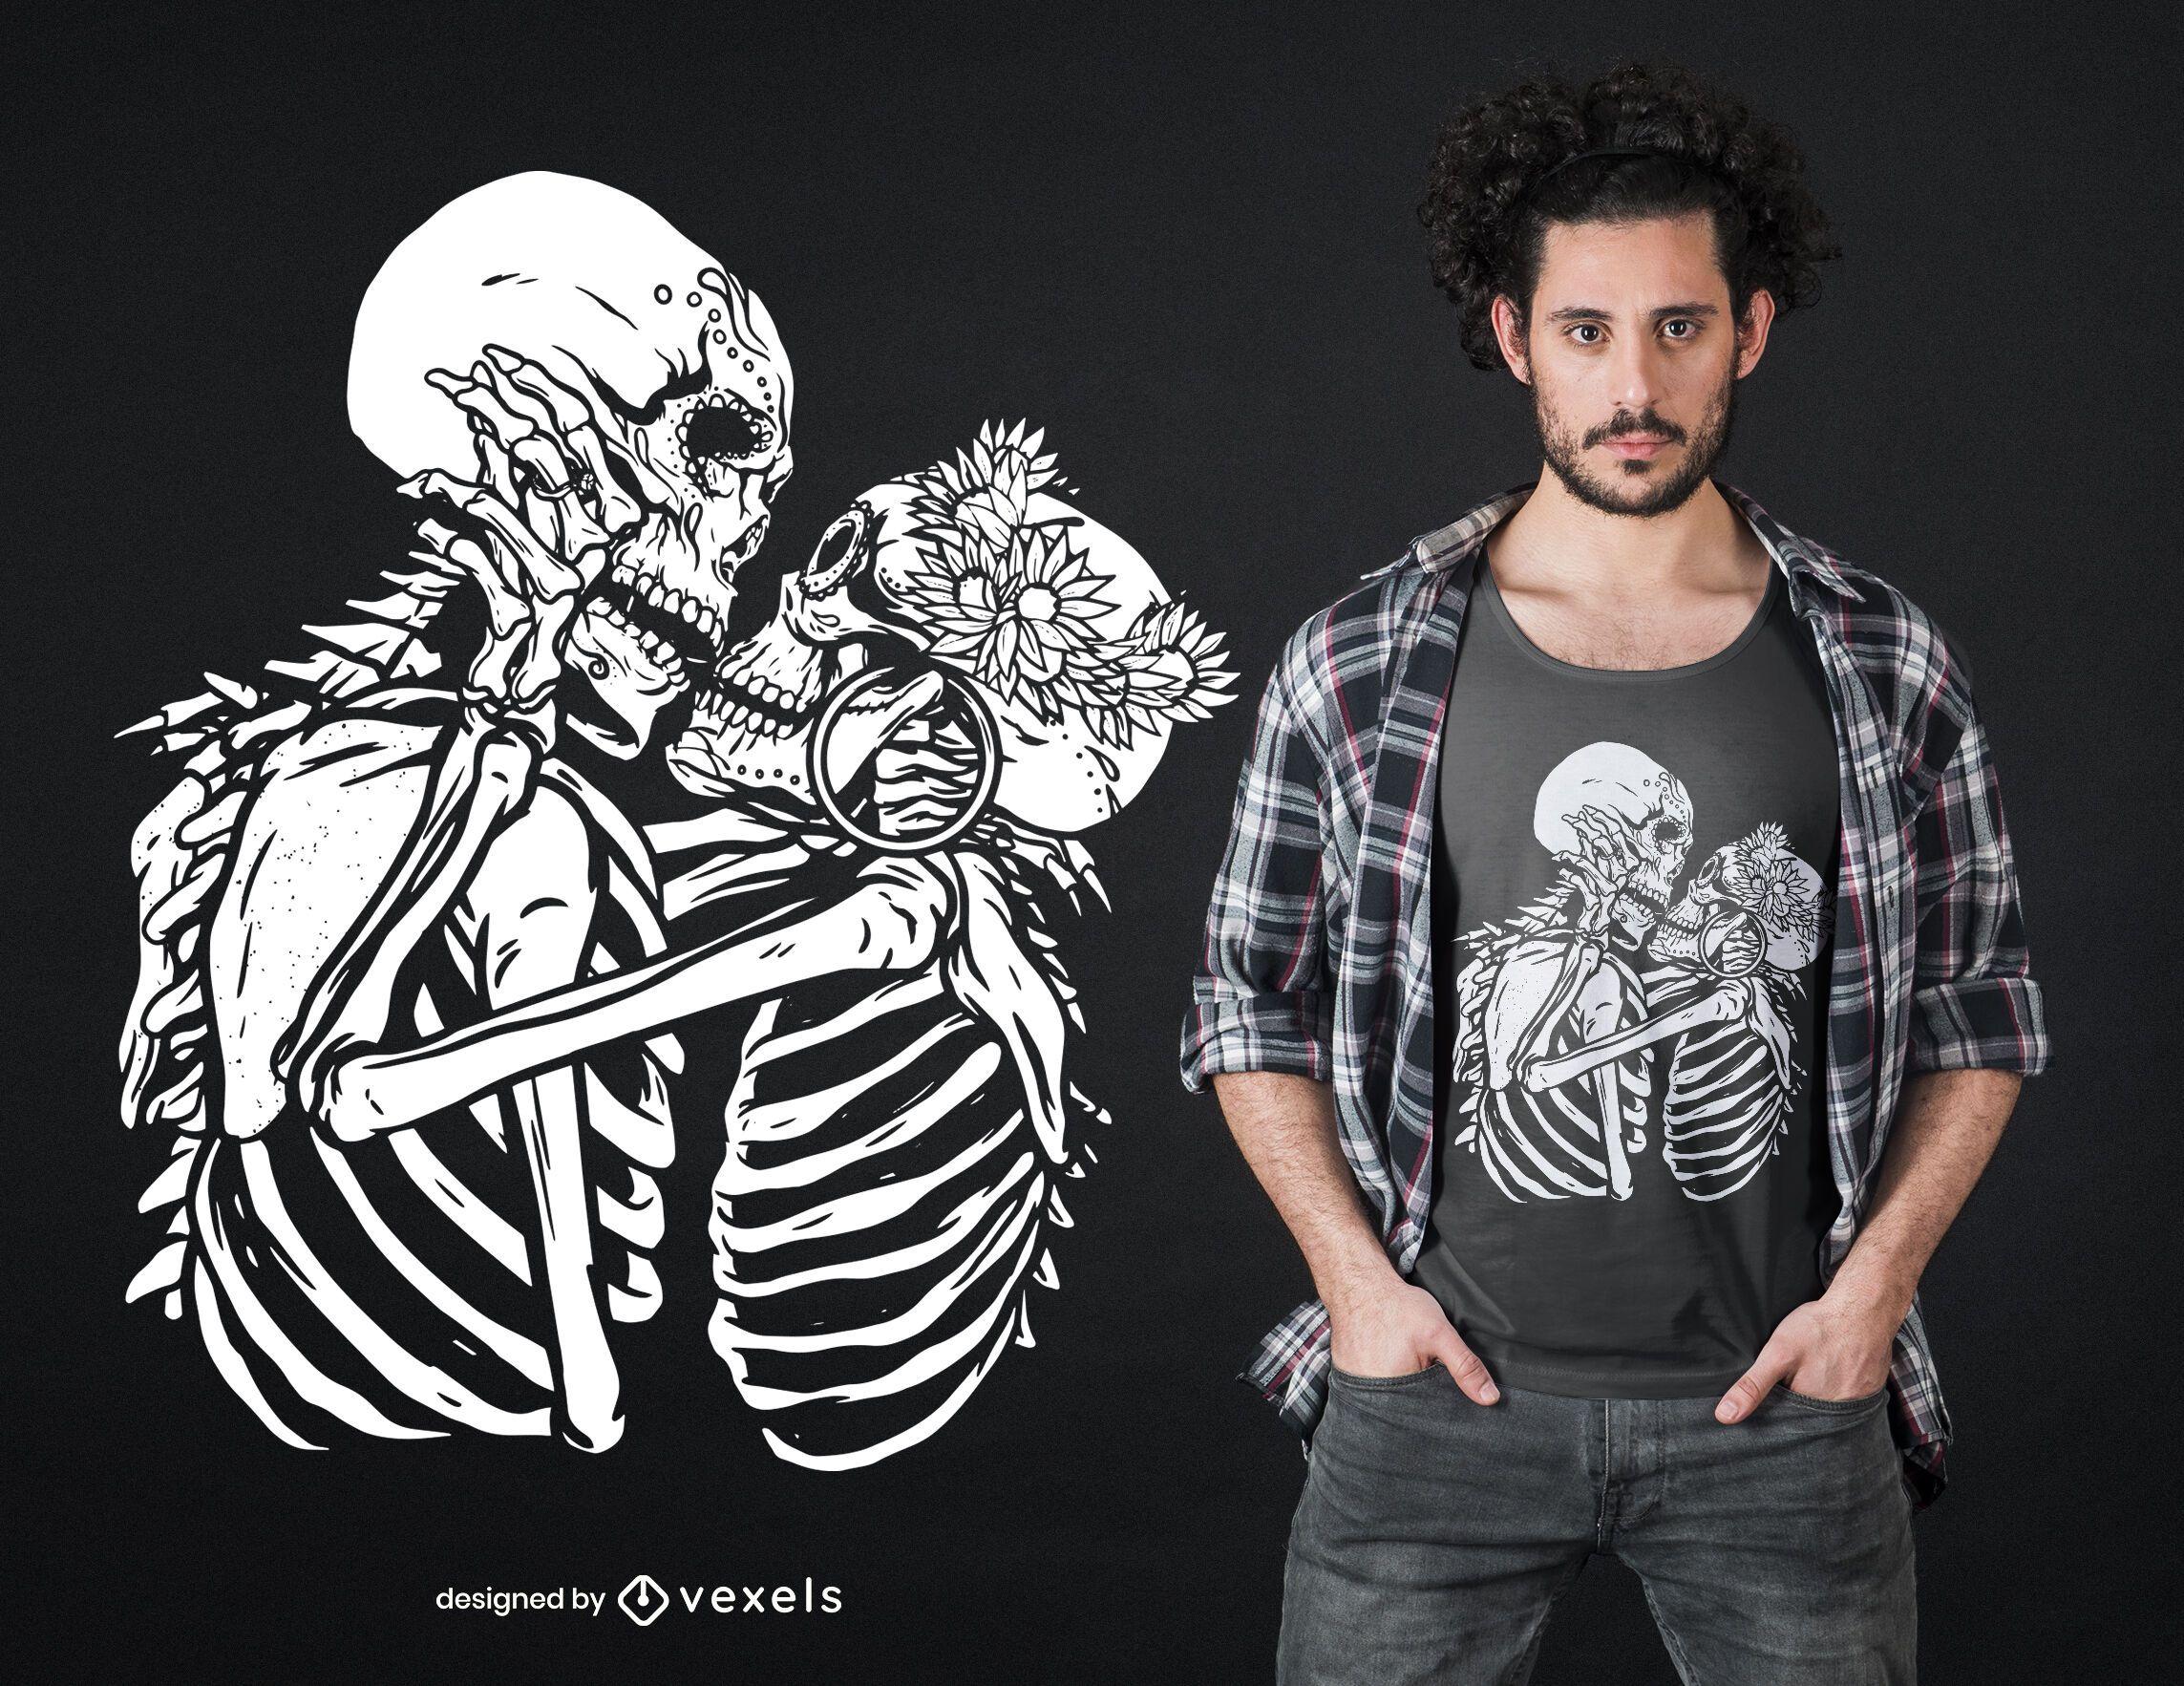 Küssen Skelette T-Shirt Design